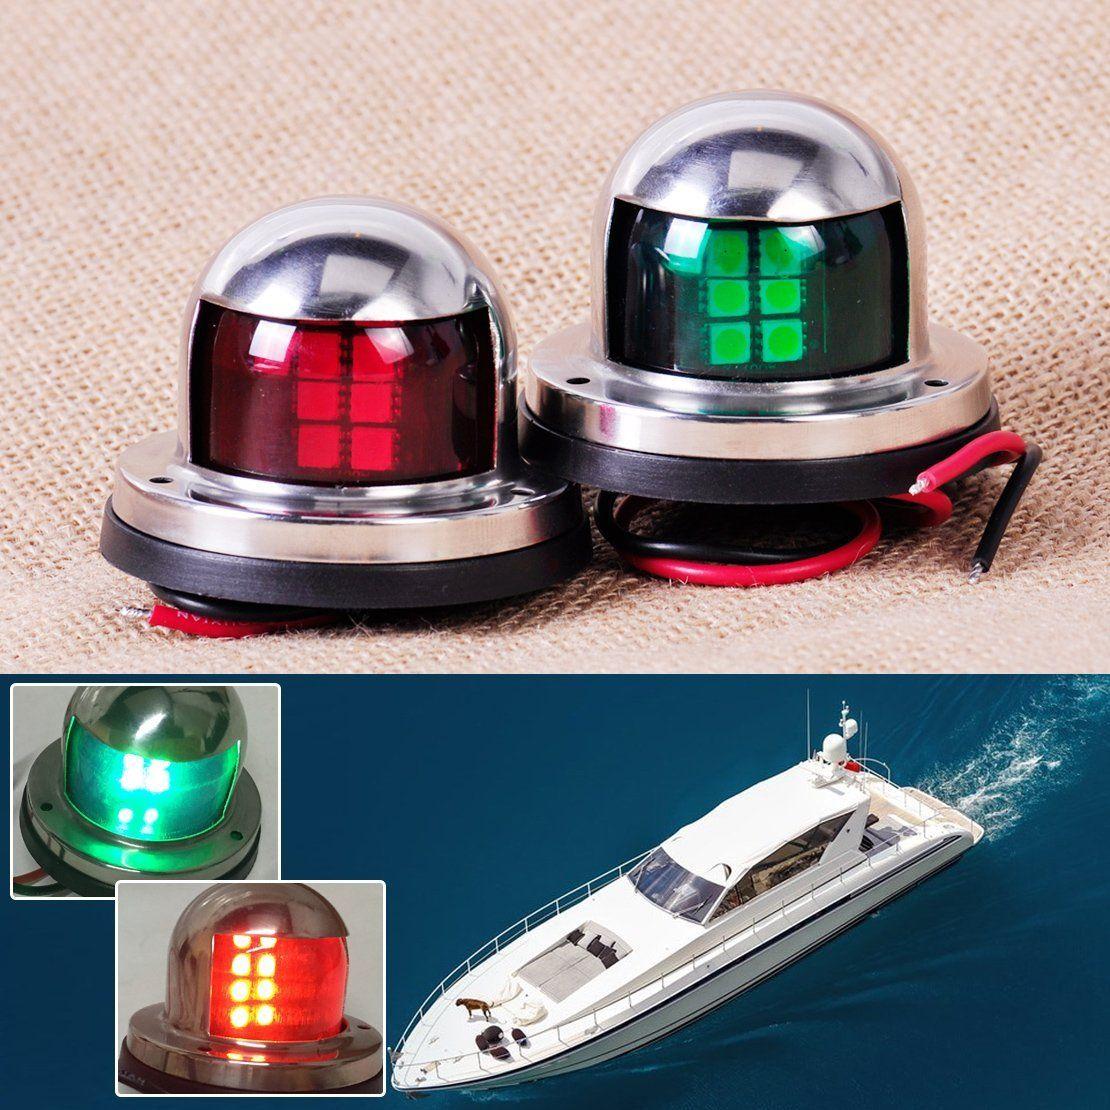 1Pair Marine Bow Light 12V Stainless Steel LED Navigation Side Lights Boat Yacht